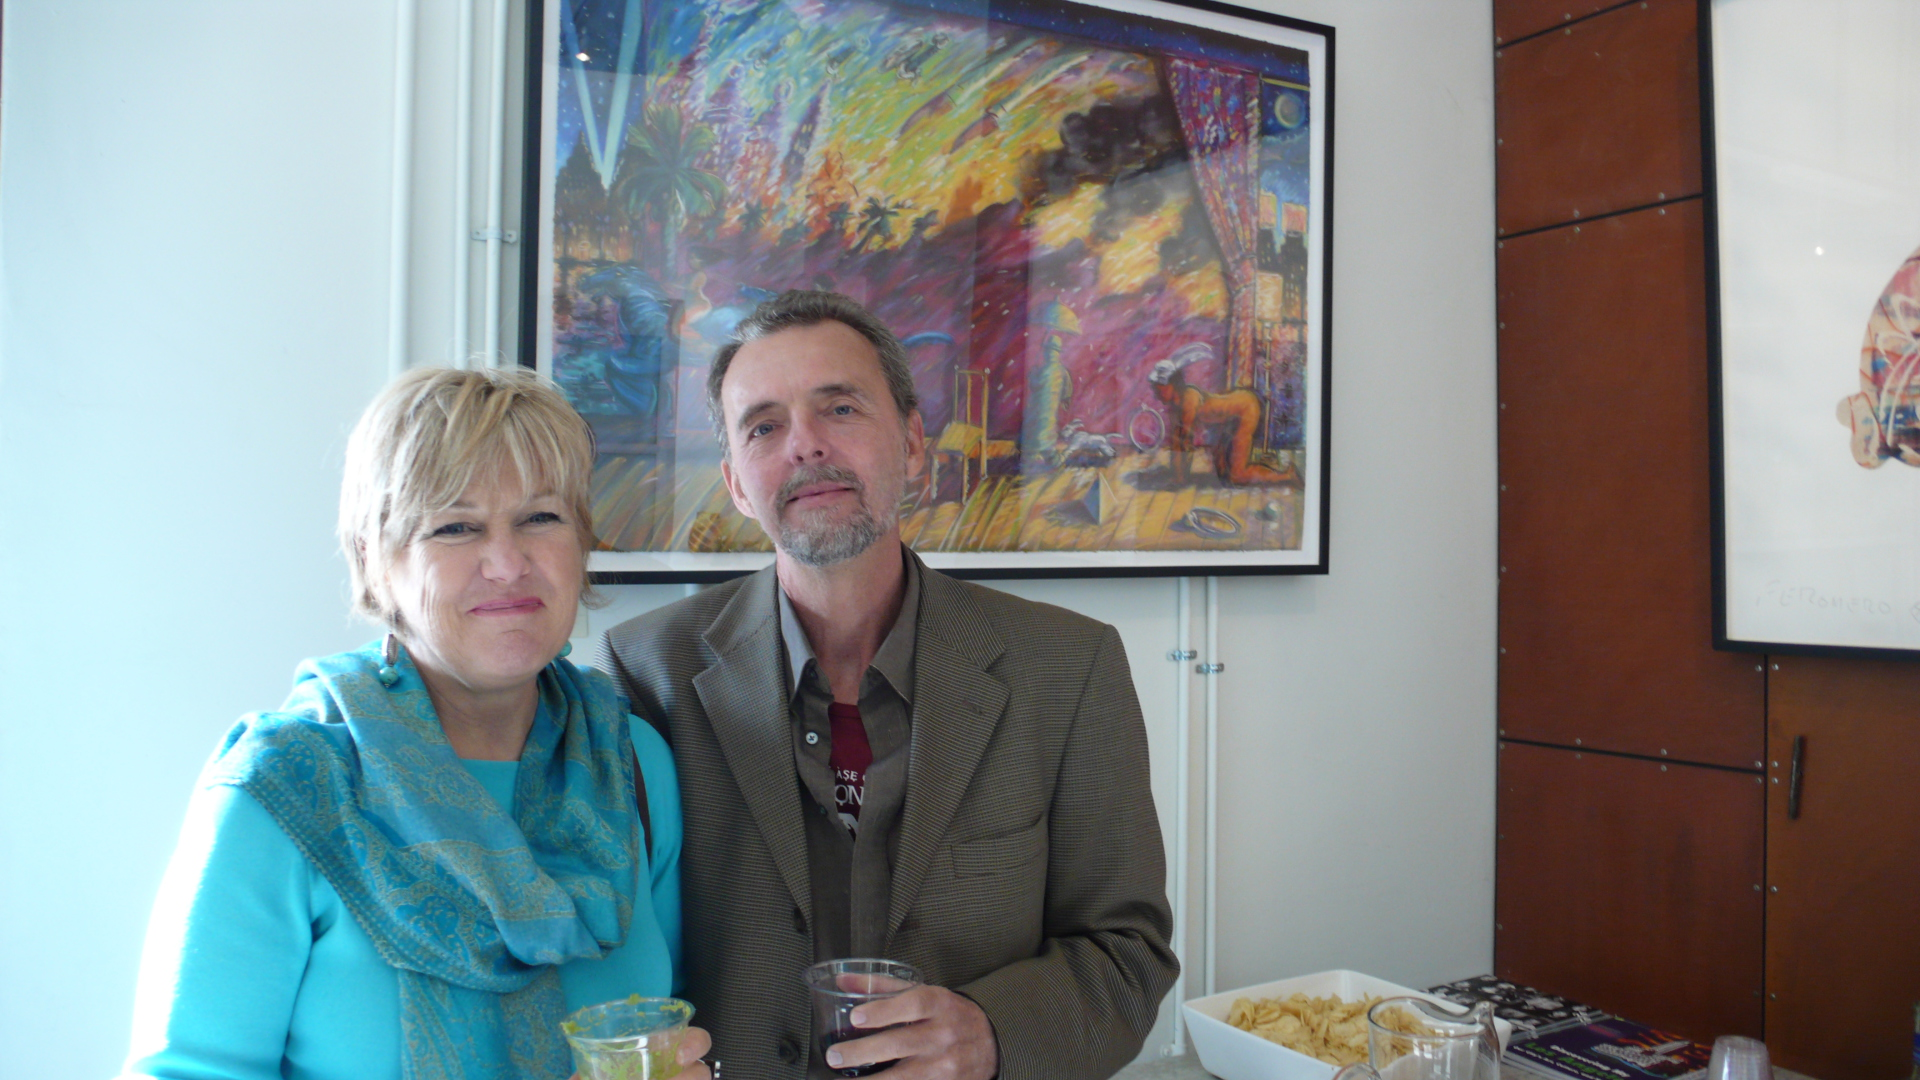 Fremont Gallery - Louis Verdad